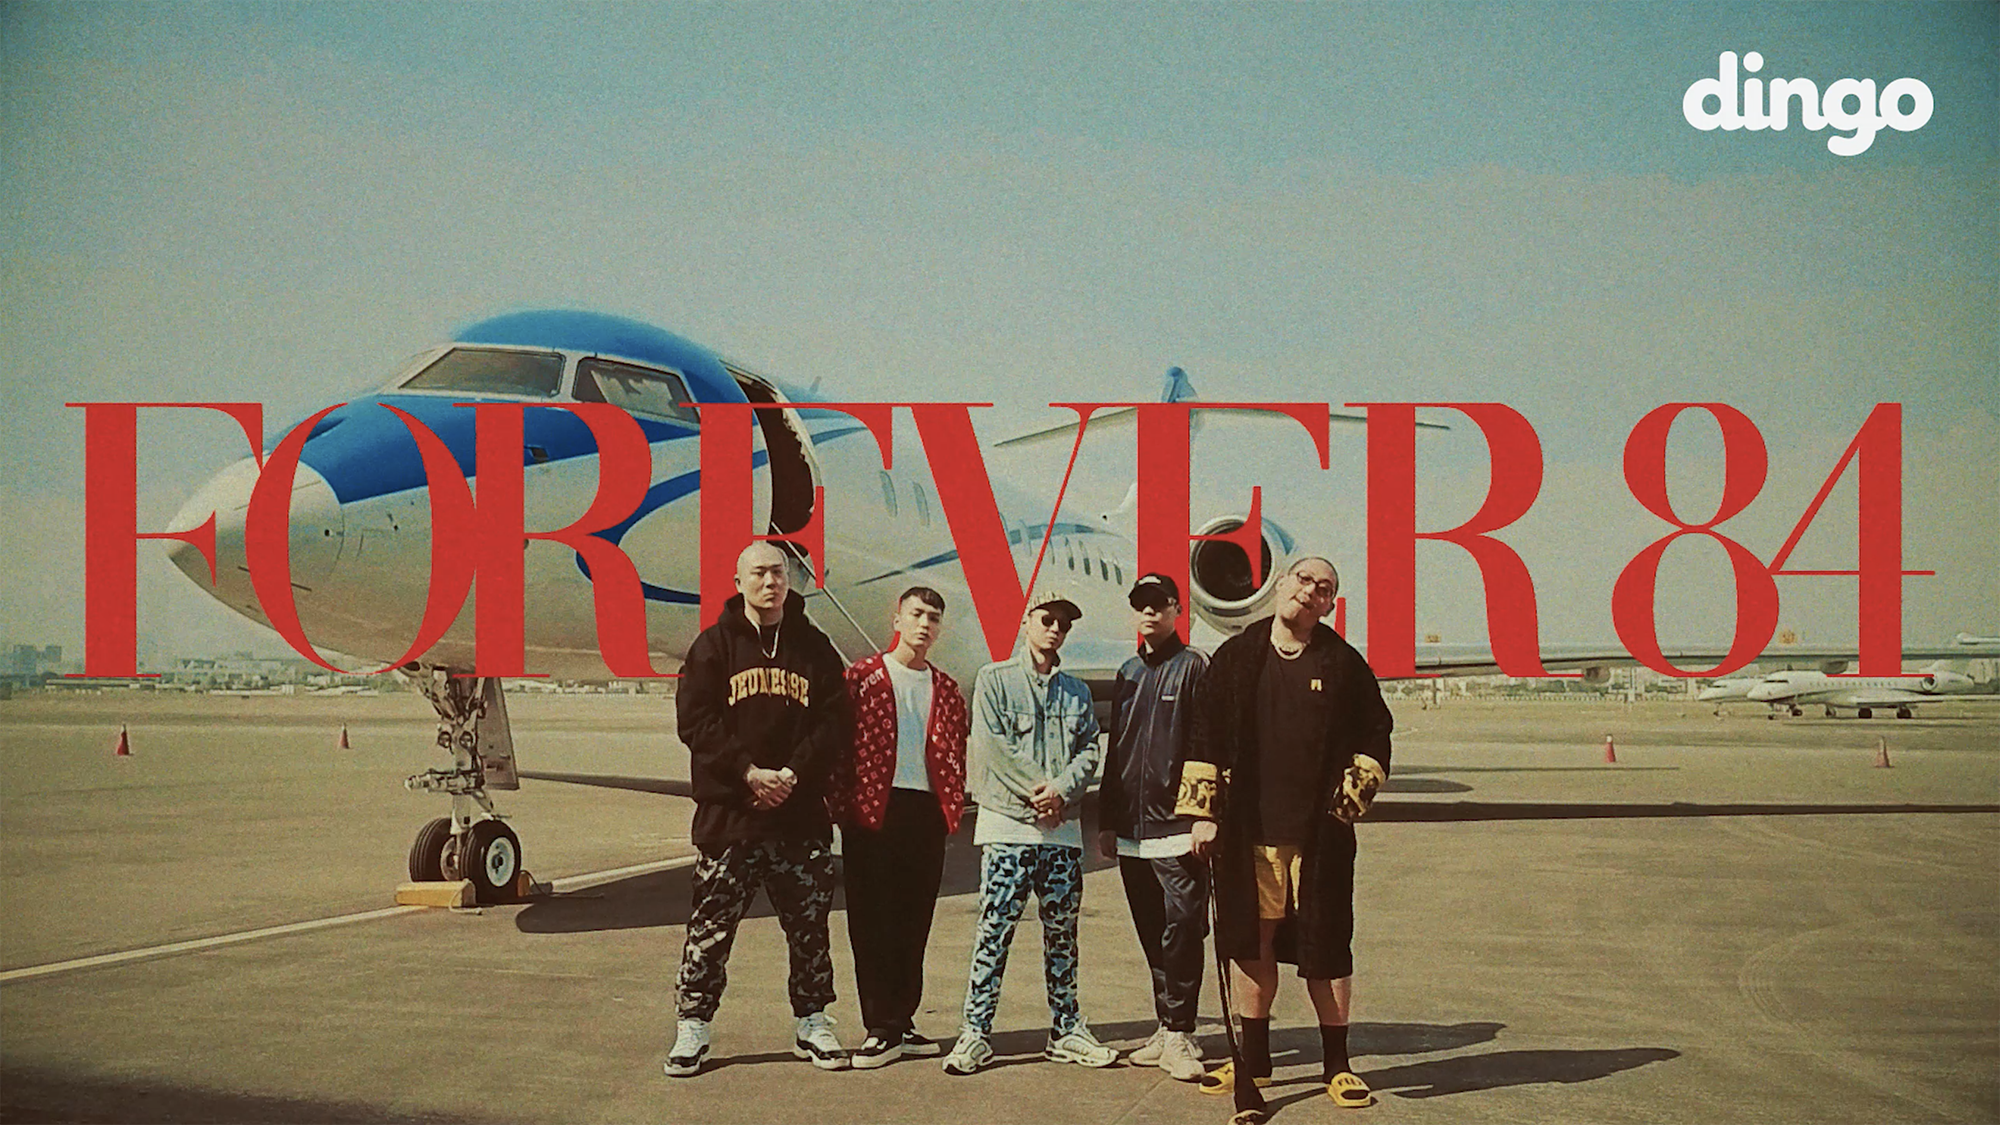 [MV] Forever 84 - 다모임 (염따, 더 콰이엇, 사이먼 도미닉, 팔로알토, 딥플로우) X 딩고 [DF FILM]